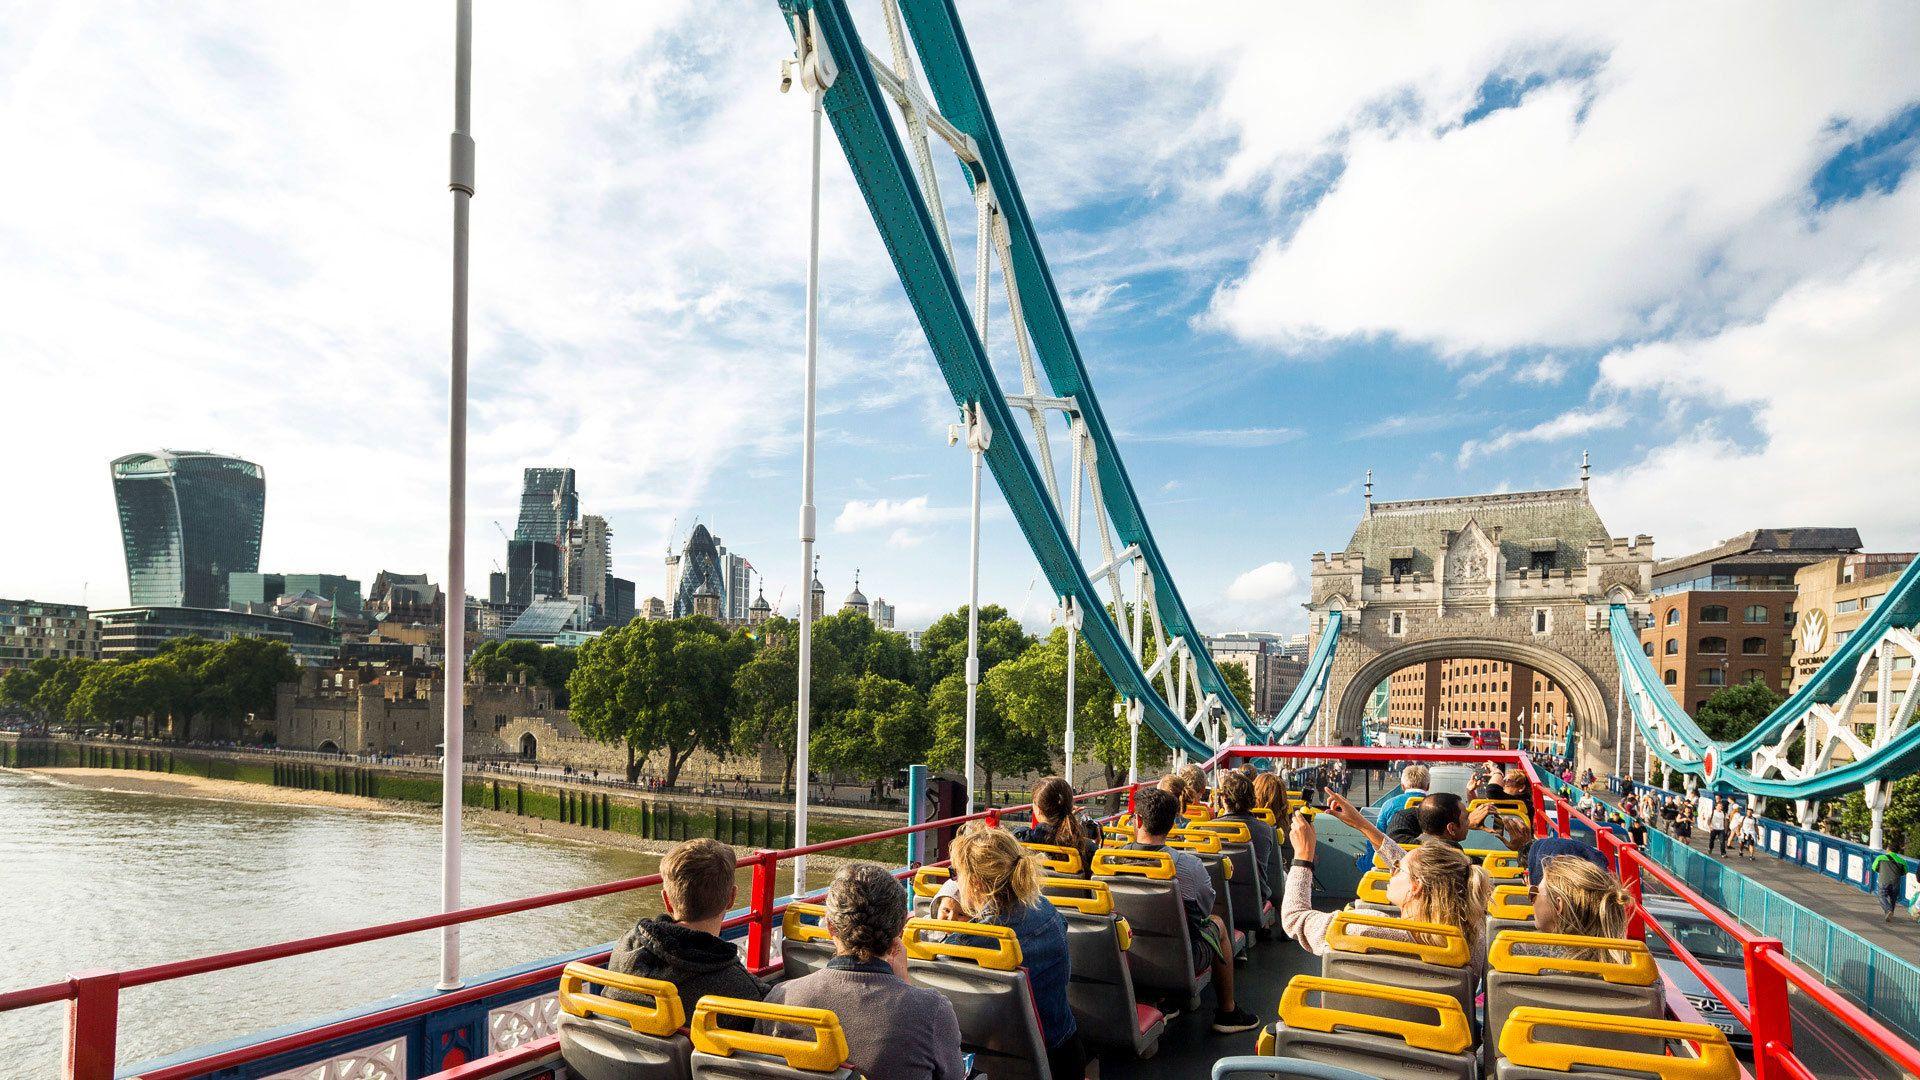 People on double decker tour bus traveling across bridge in London